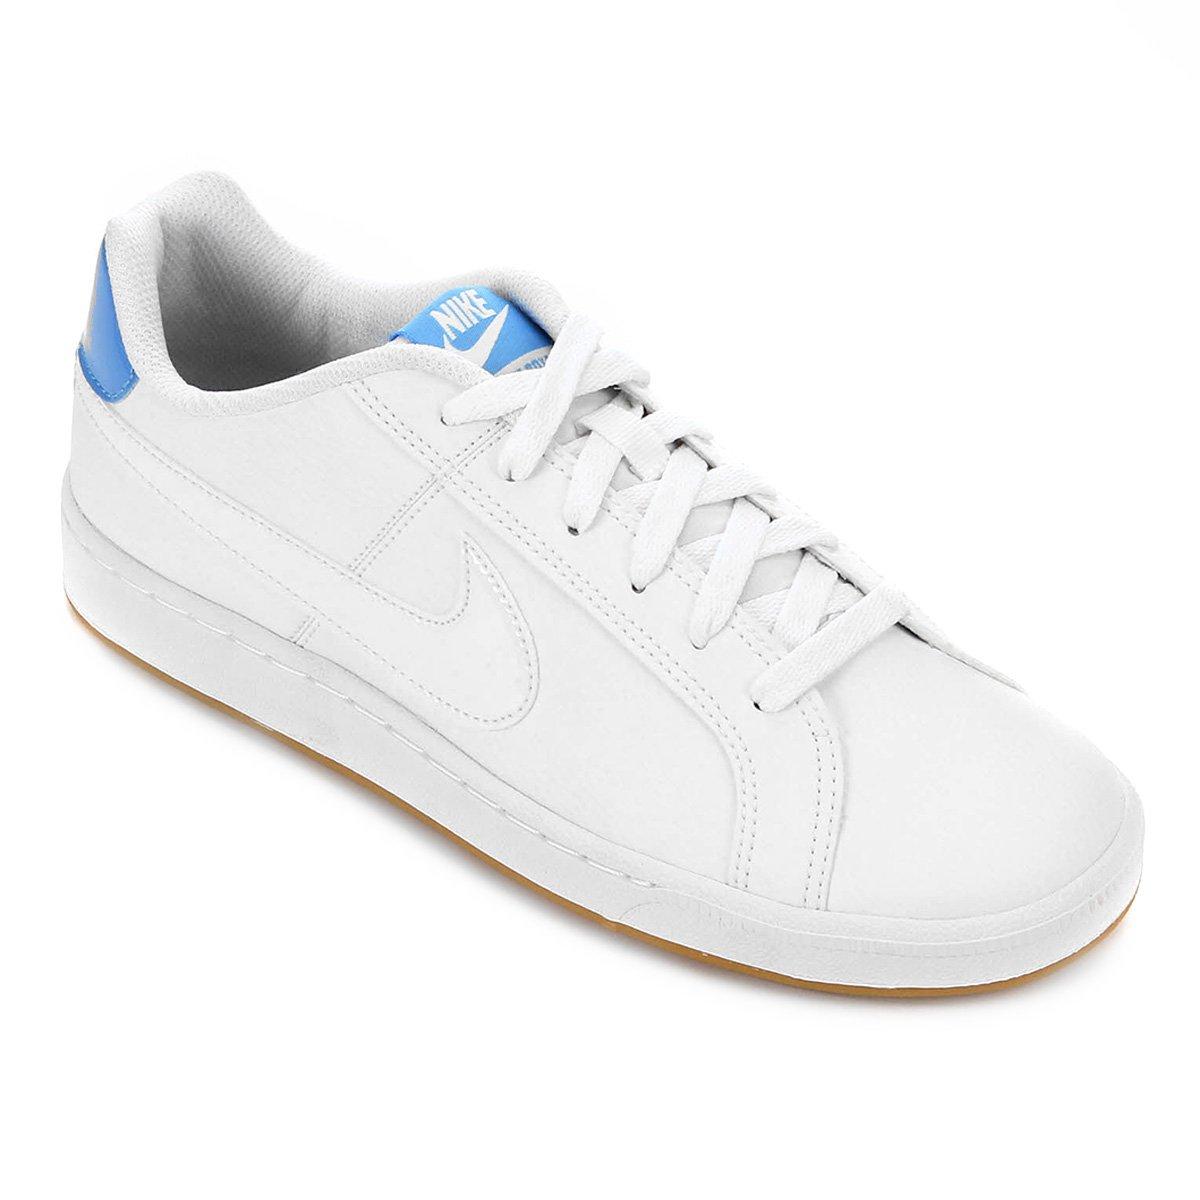 Tênis Couro Nike Court Royale Feminino Branco E Azul